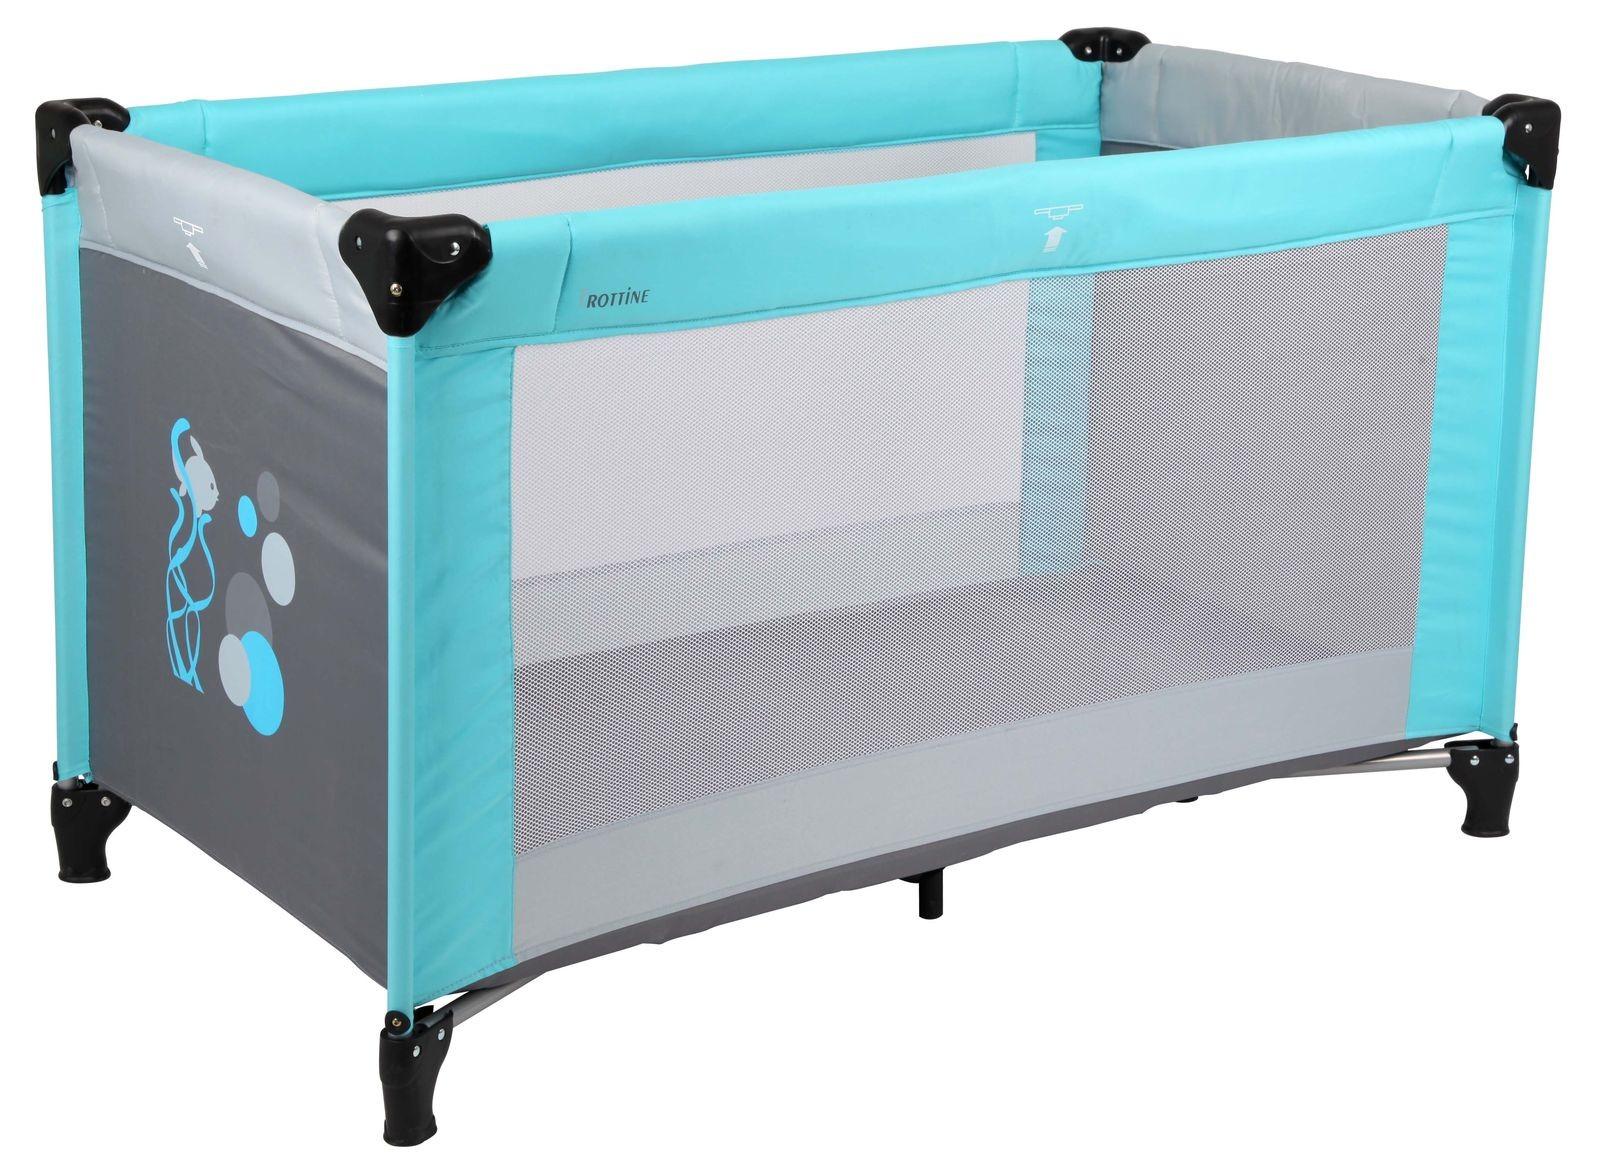 lit parapluie 60x120cm trottine districenter. Black Bedroom Furniture Sets. Home Design Ideas